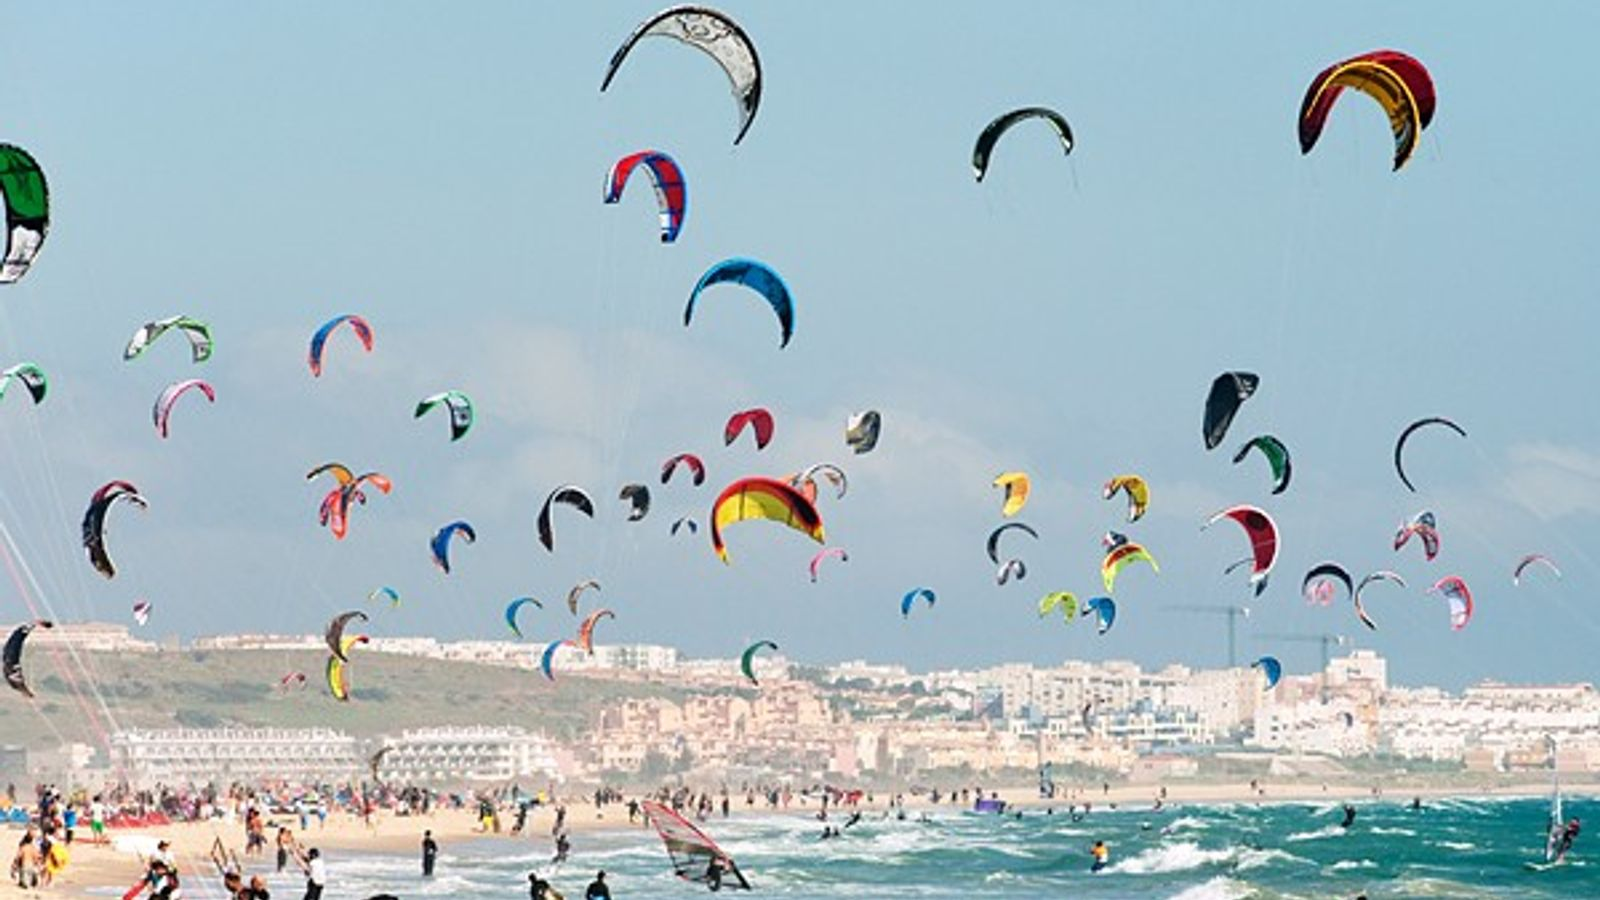 Faire du kitesurf à Tarifa, en Espagne